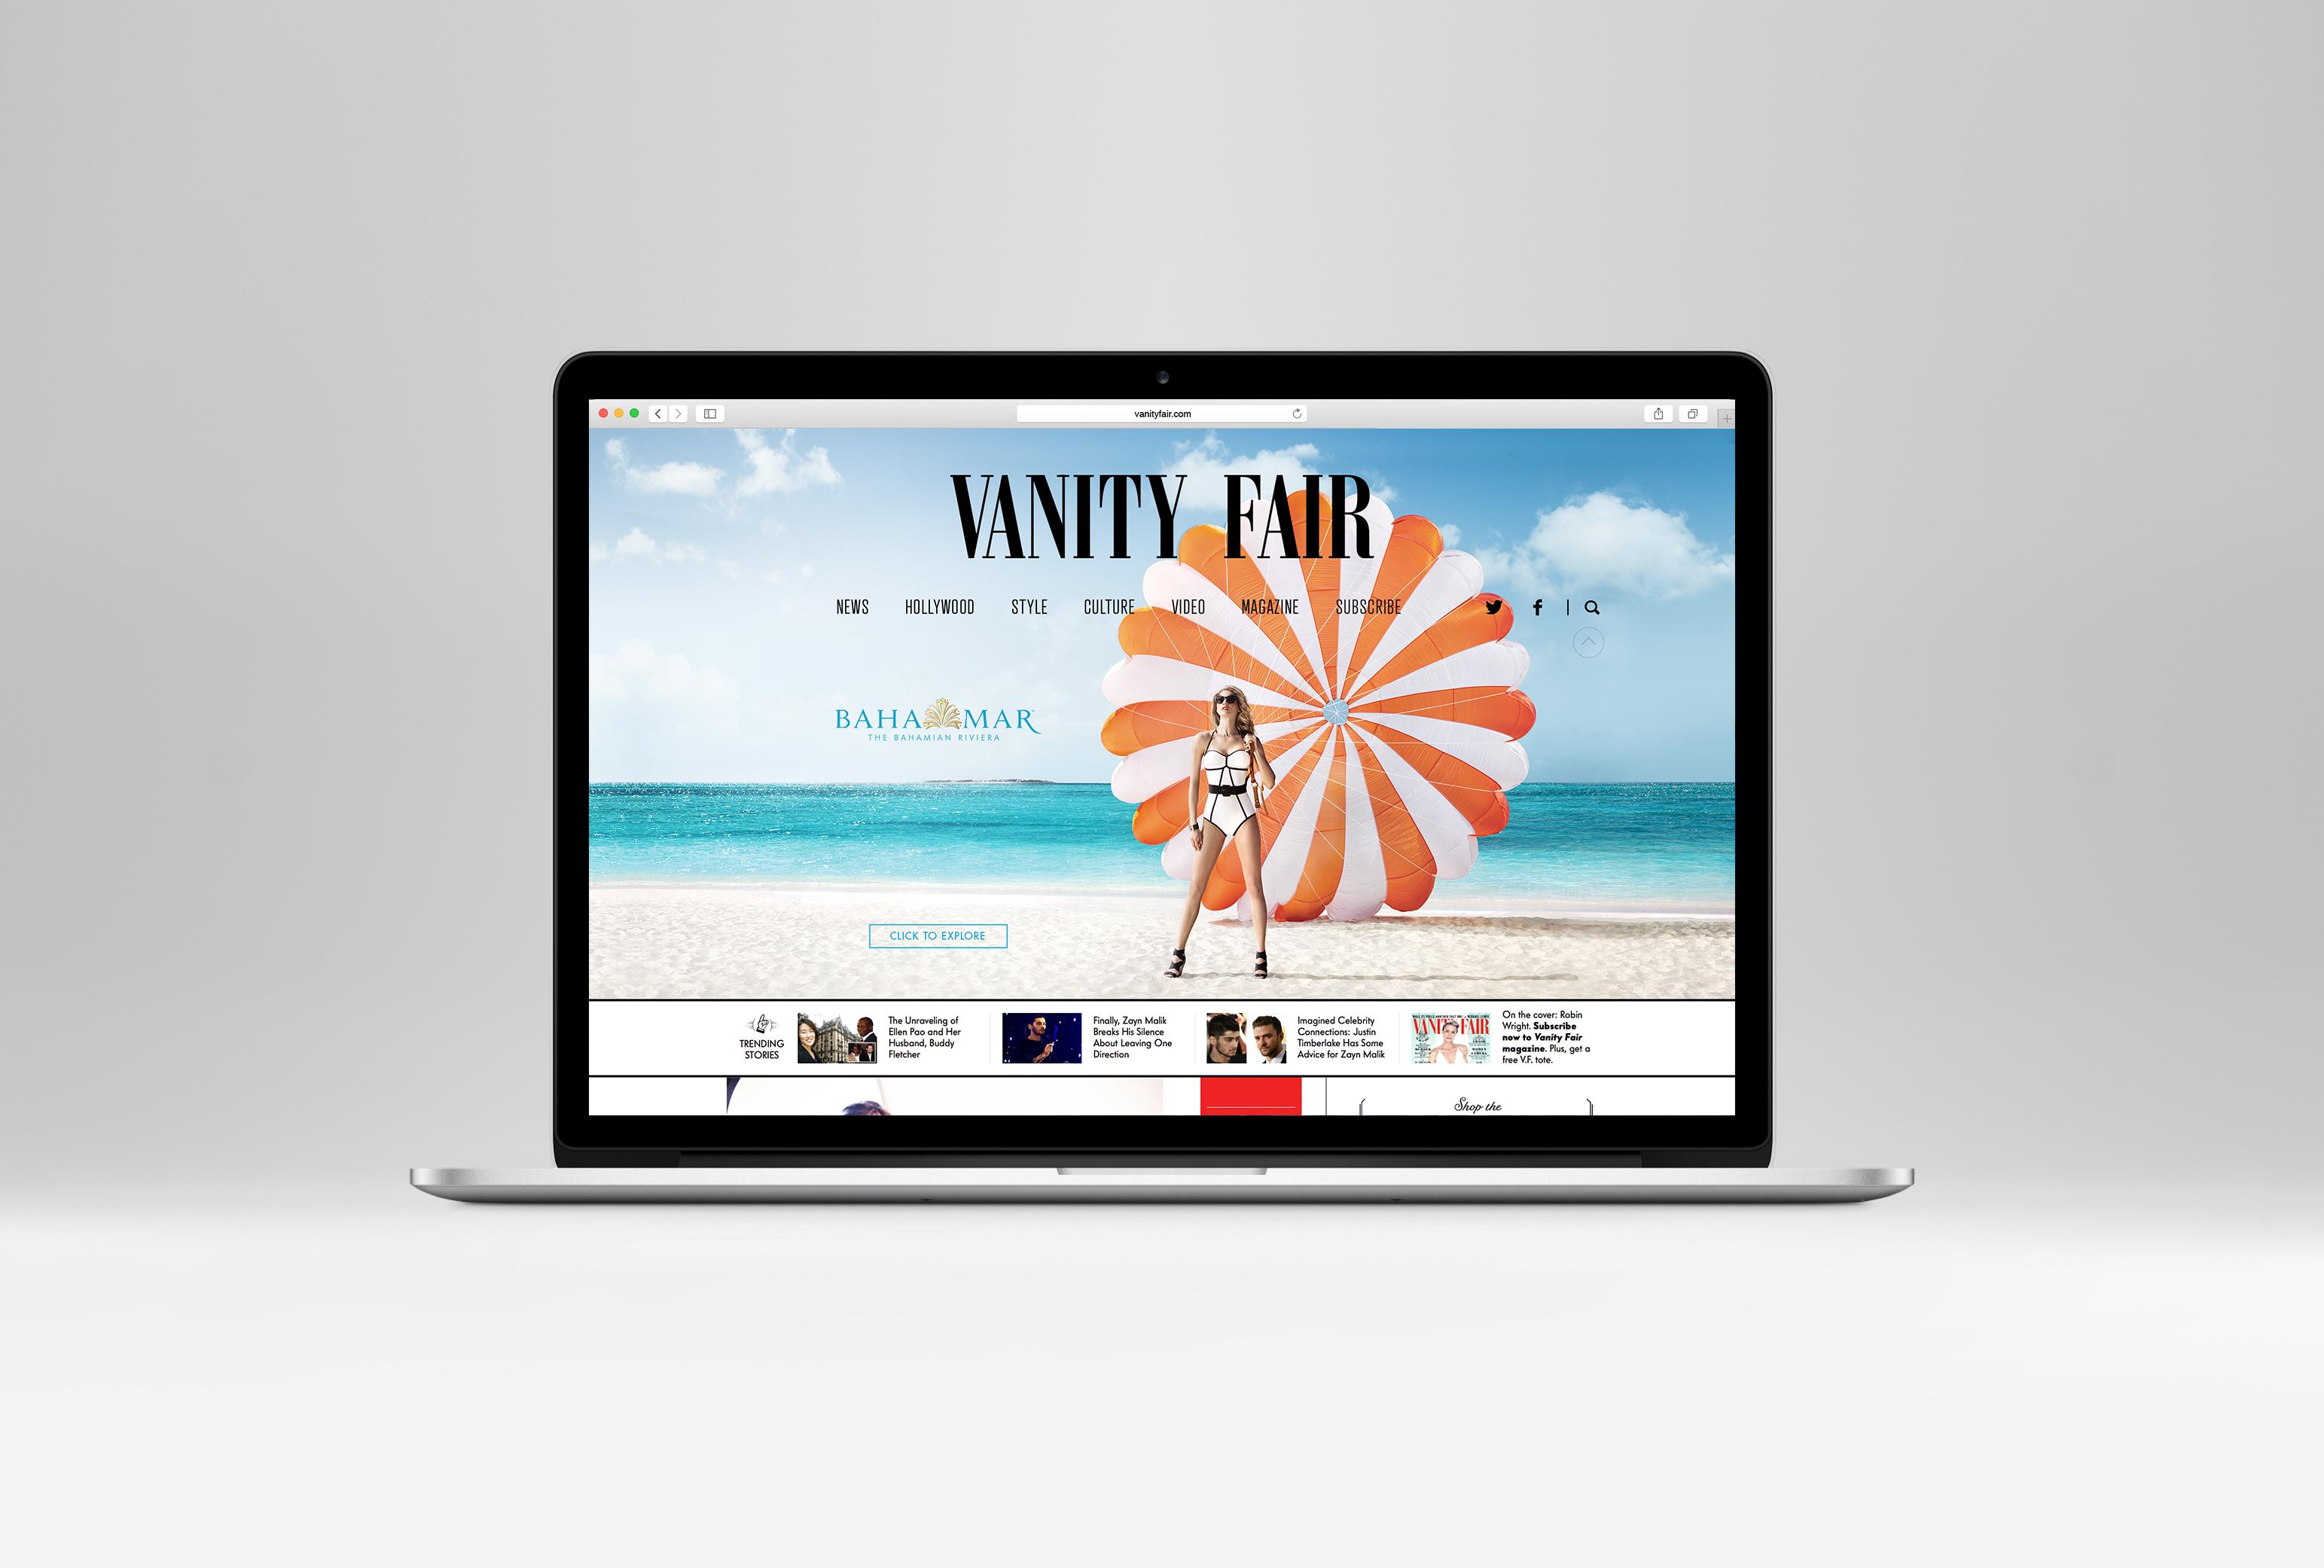 BahaMar_Digital_VanityFairLaptop